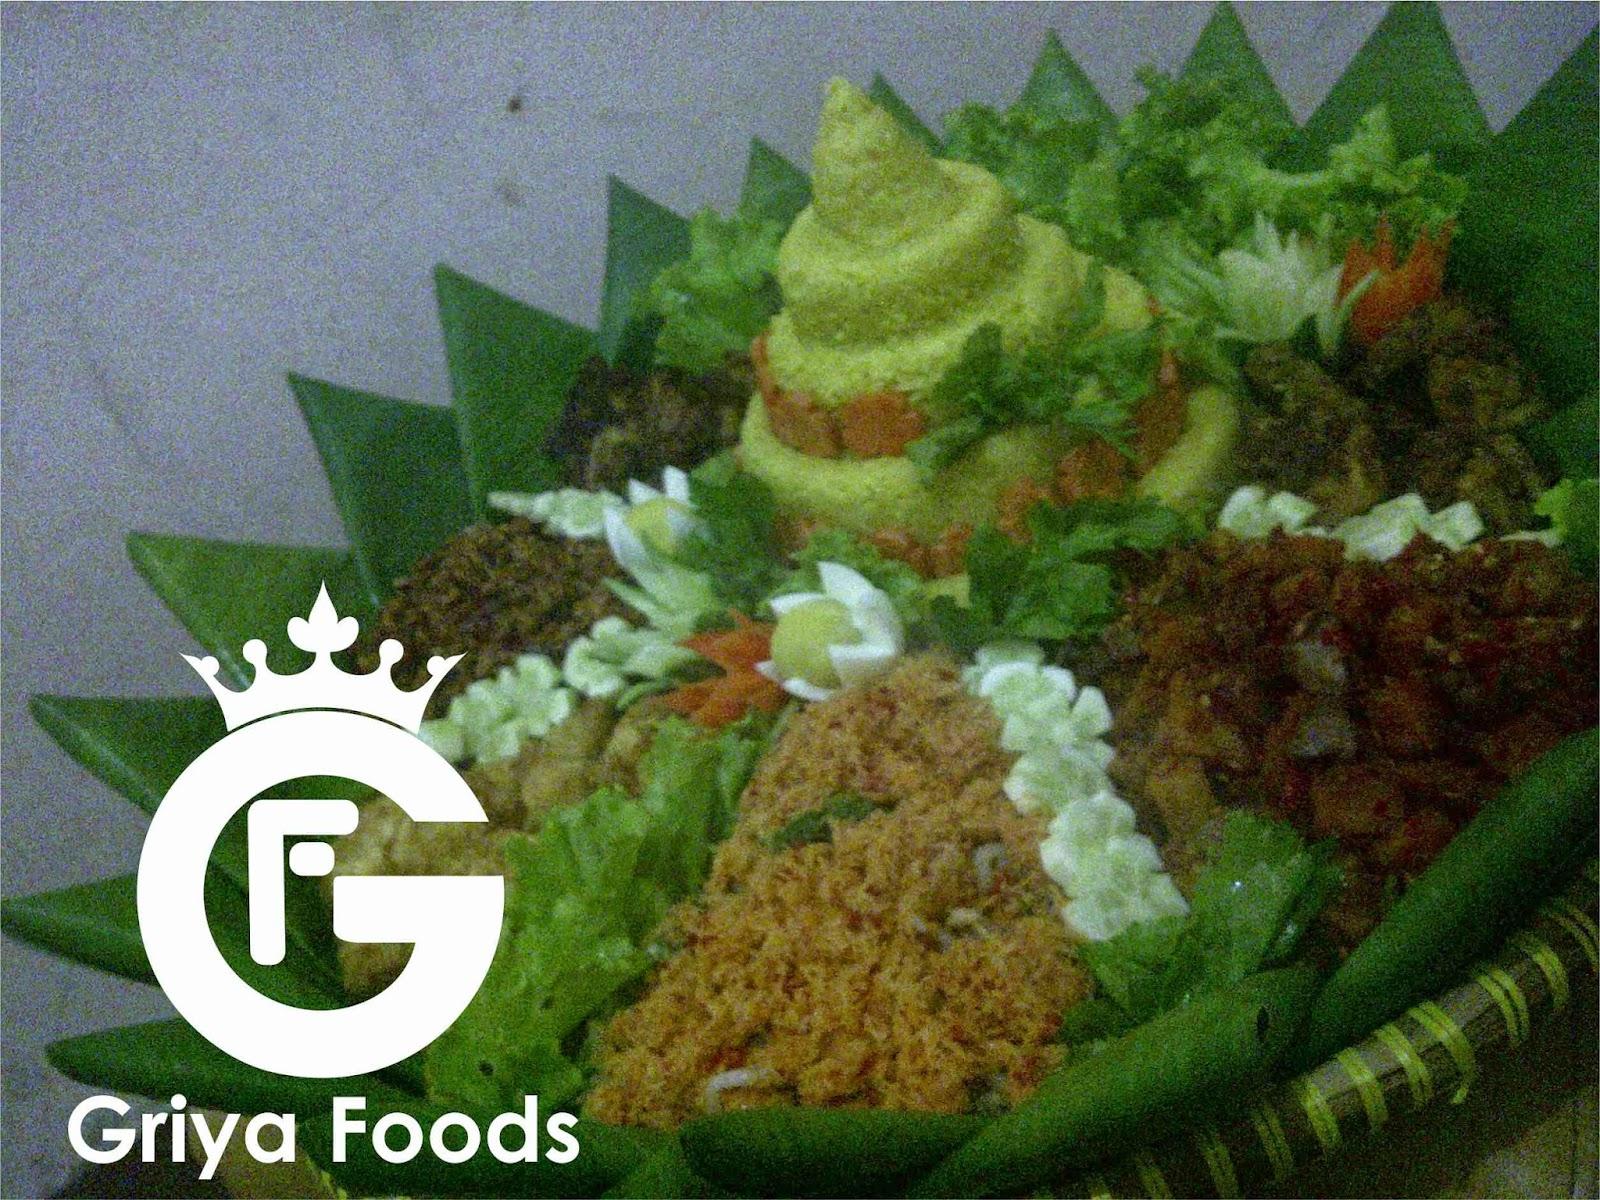 Jual Nasi tumpeng pekanbaru, nasi tumpeng murah di pekanbaru, sedia nasi tumpeng di pekanbaru, tumpeng jawa di pekanbaru, tumpeng murah di pekanbaru